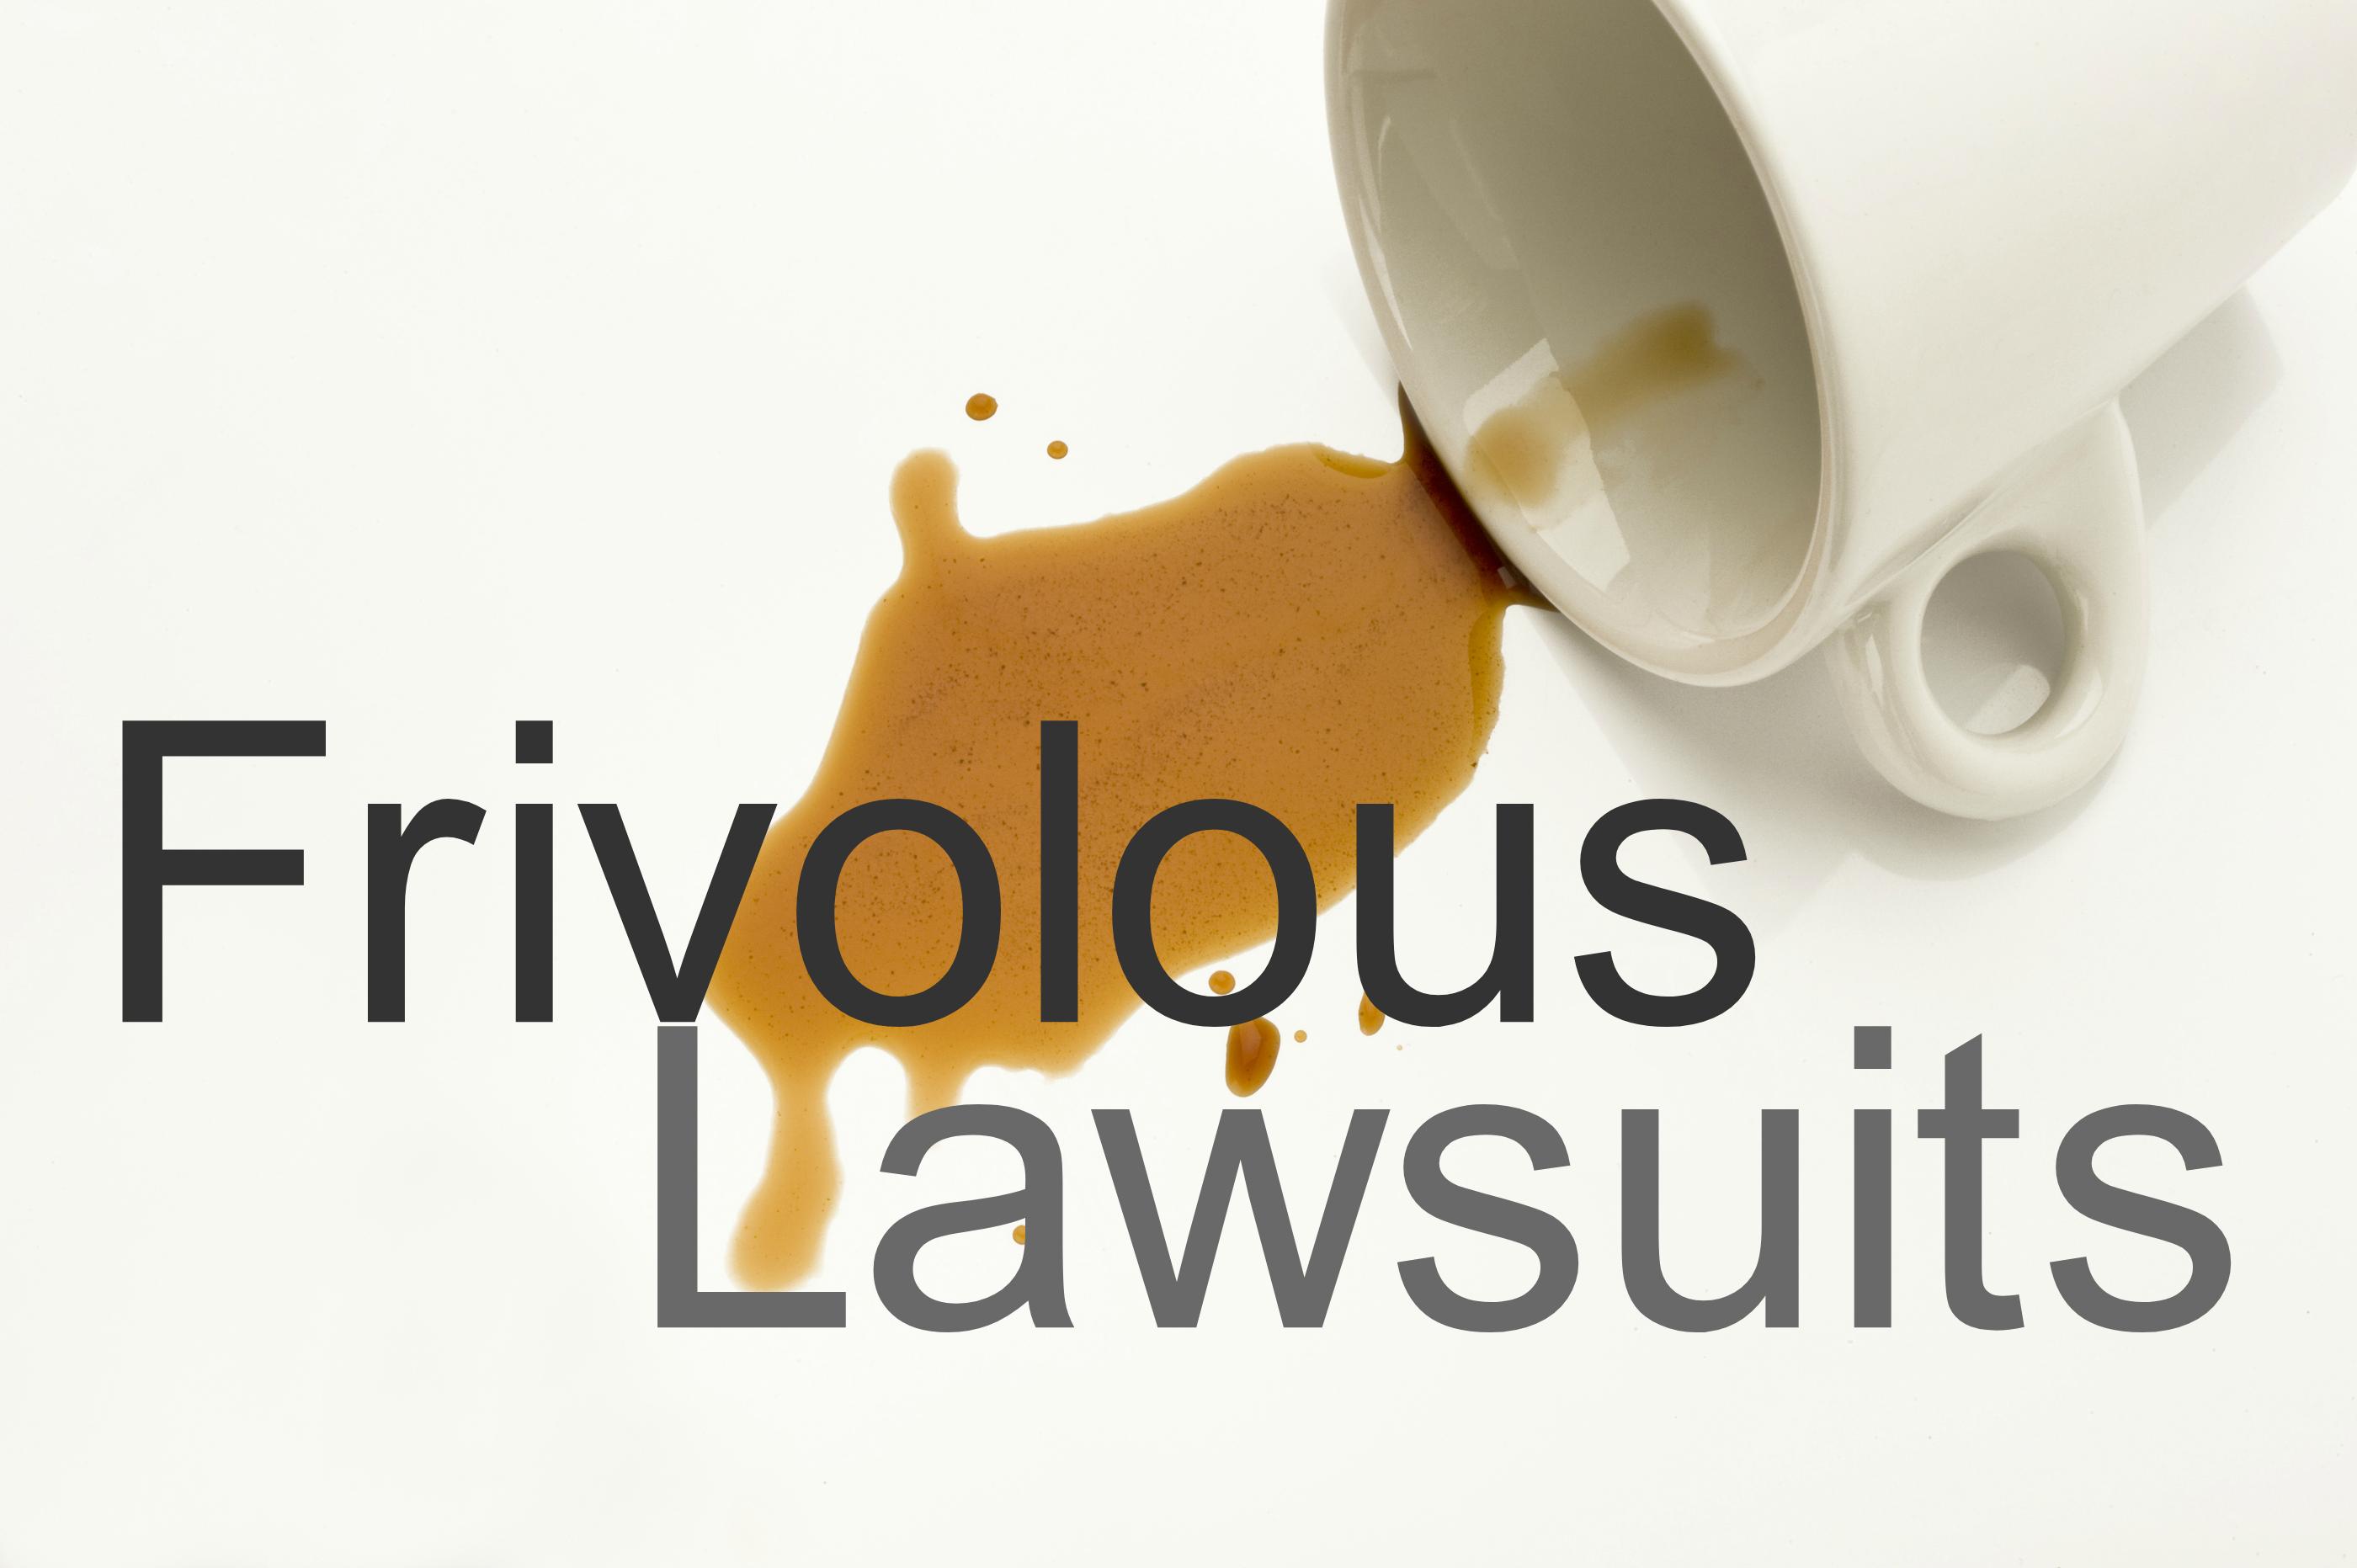 Florida-Lawyer-Makes $1 Million-from-fake-lawsuits-crimeshop.jpeg